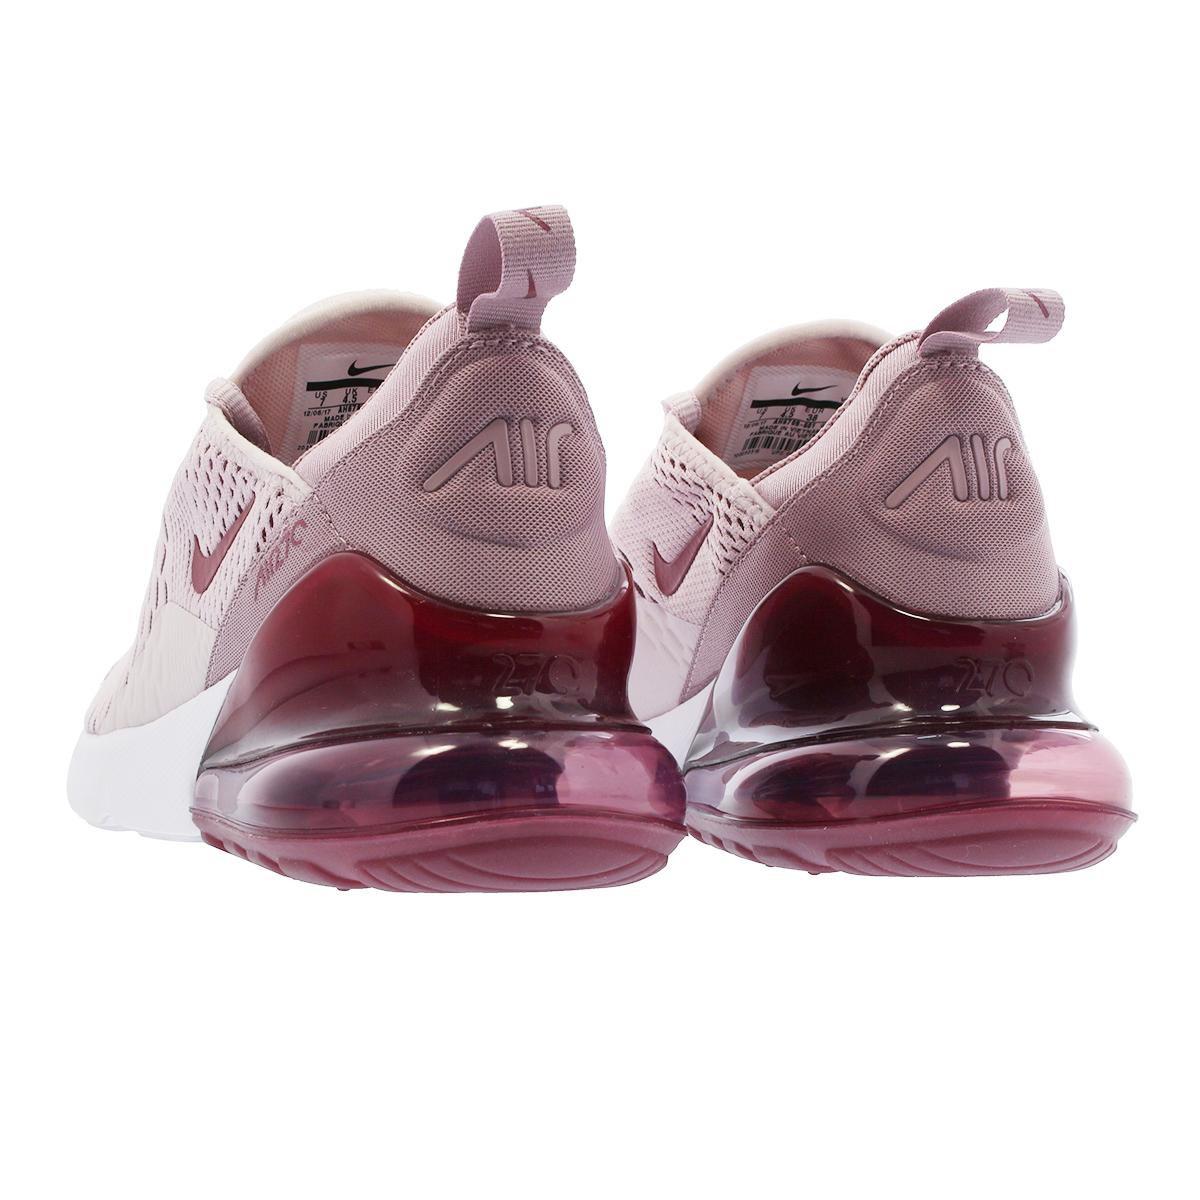 NIKE WMNS AIR MAX 270 Nike women Air Max 270 BARELY ROSEWHITEVINTAGE WINE ah6789 601 l